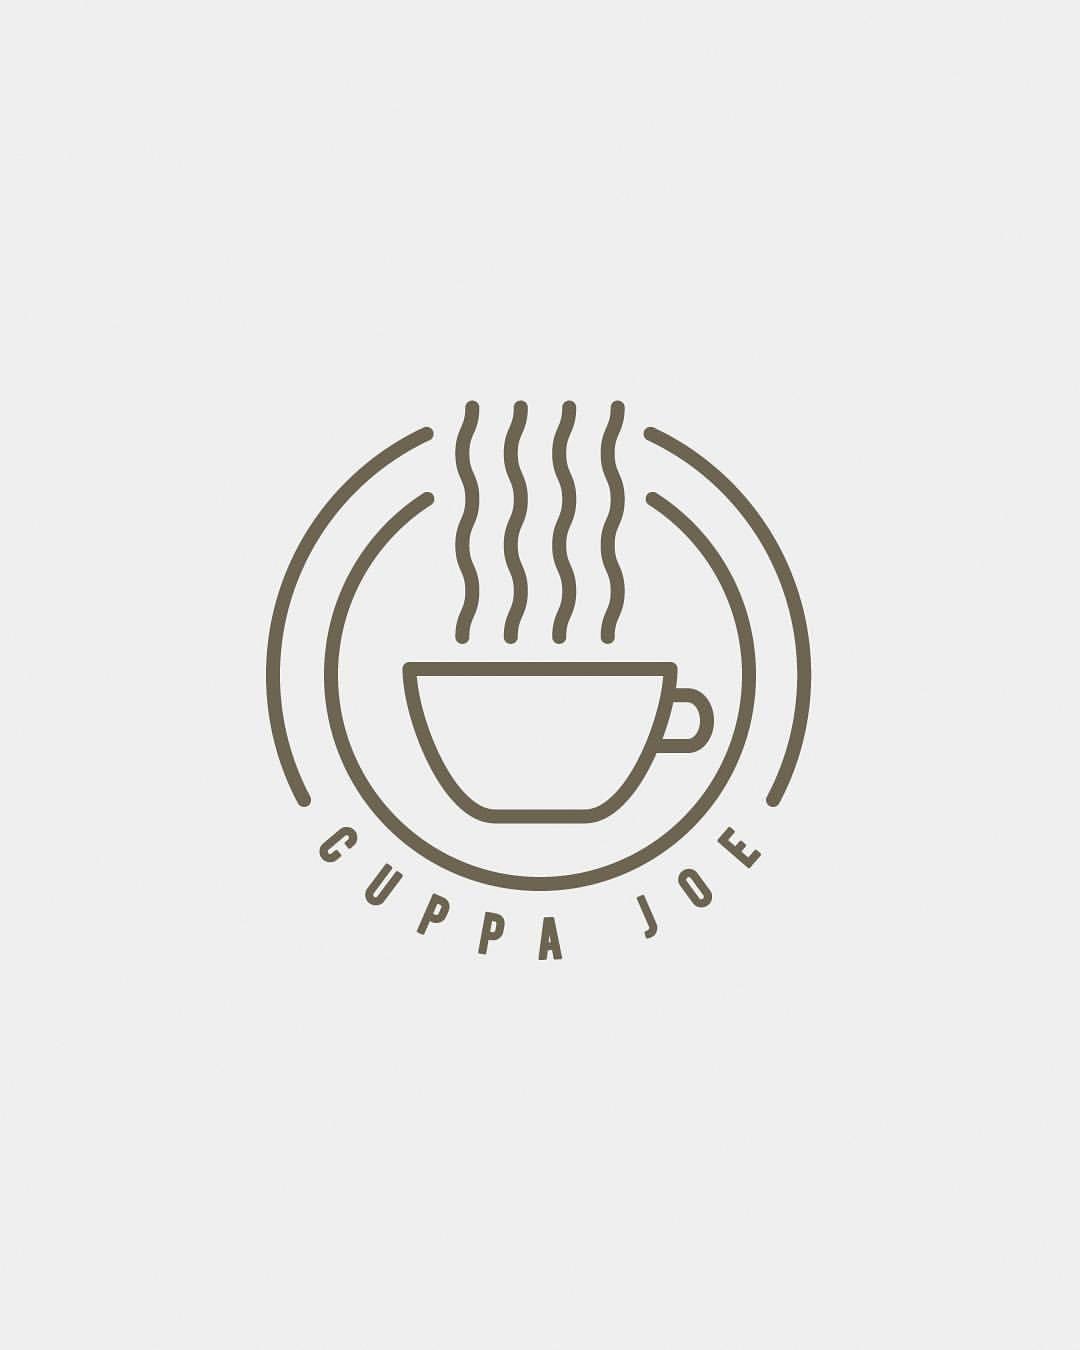 Buy Coffee Near Me Willcoffeehelpamigraine Refferal 2371643239 Coffeebags In 2020 Coffee Shop Logo Design Cafe Logo Design Coffee Shop Logo